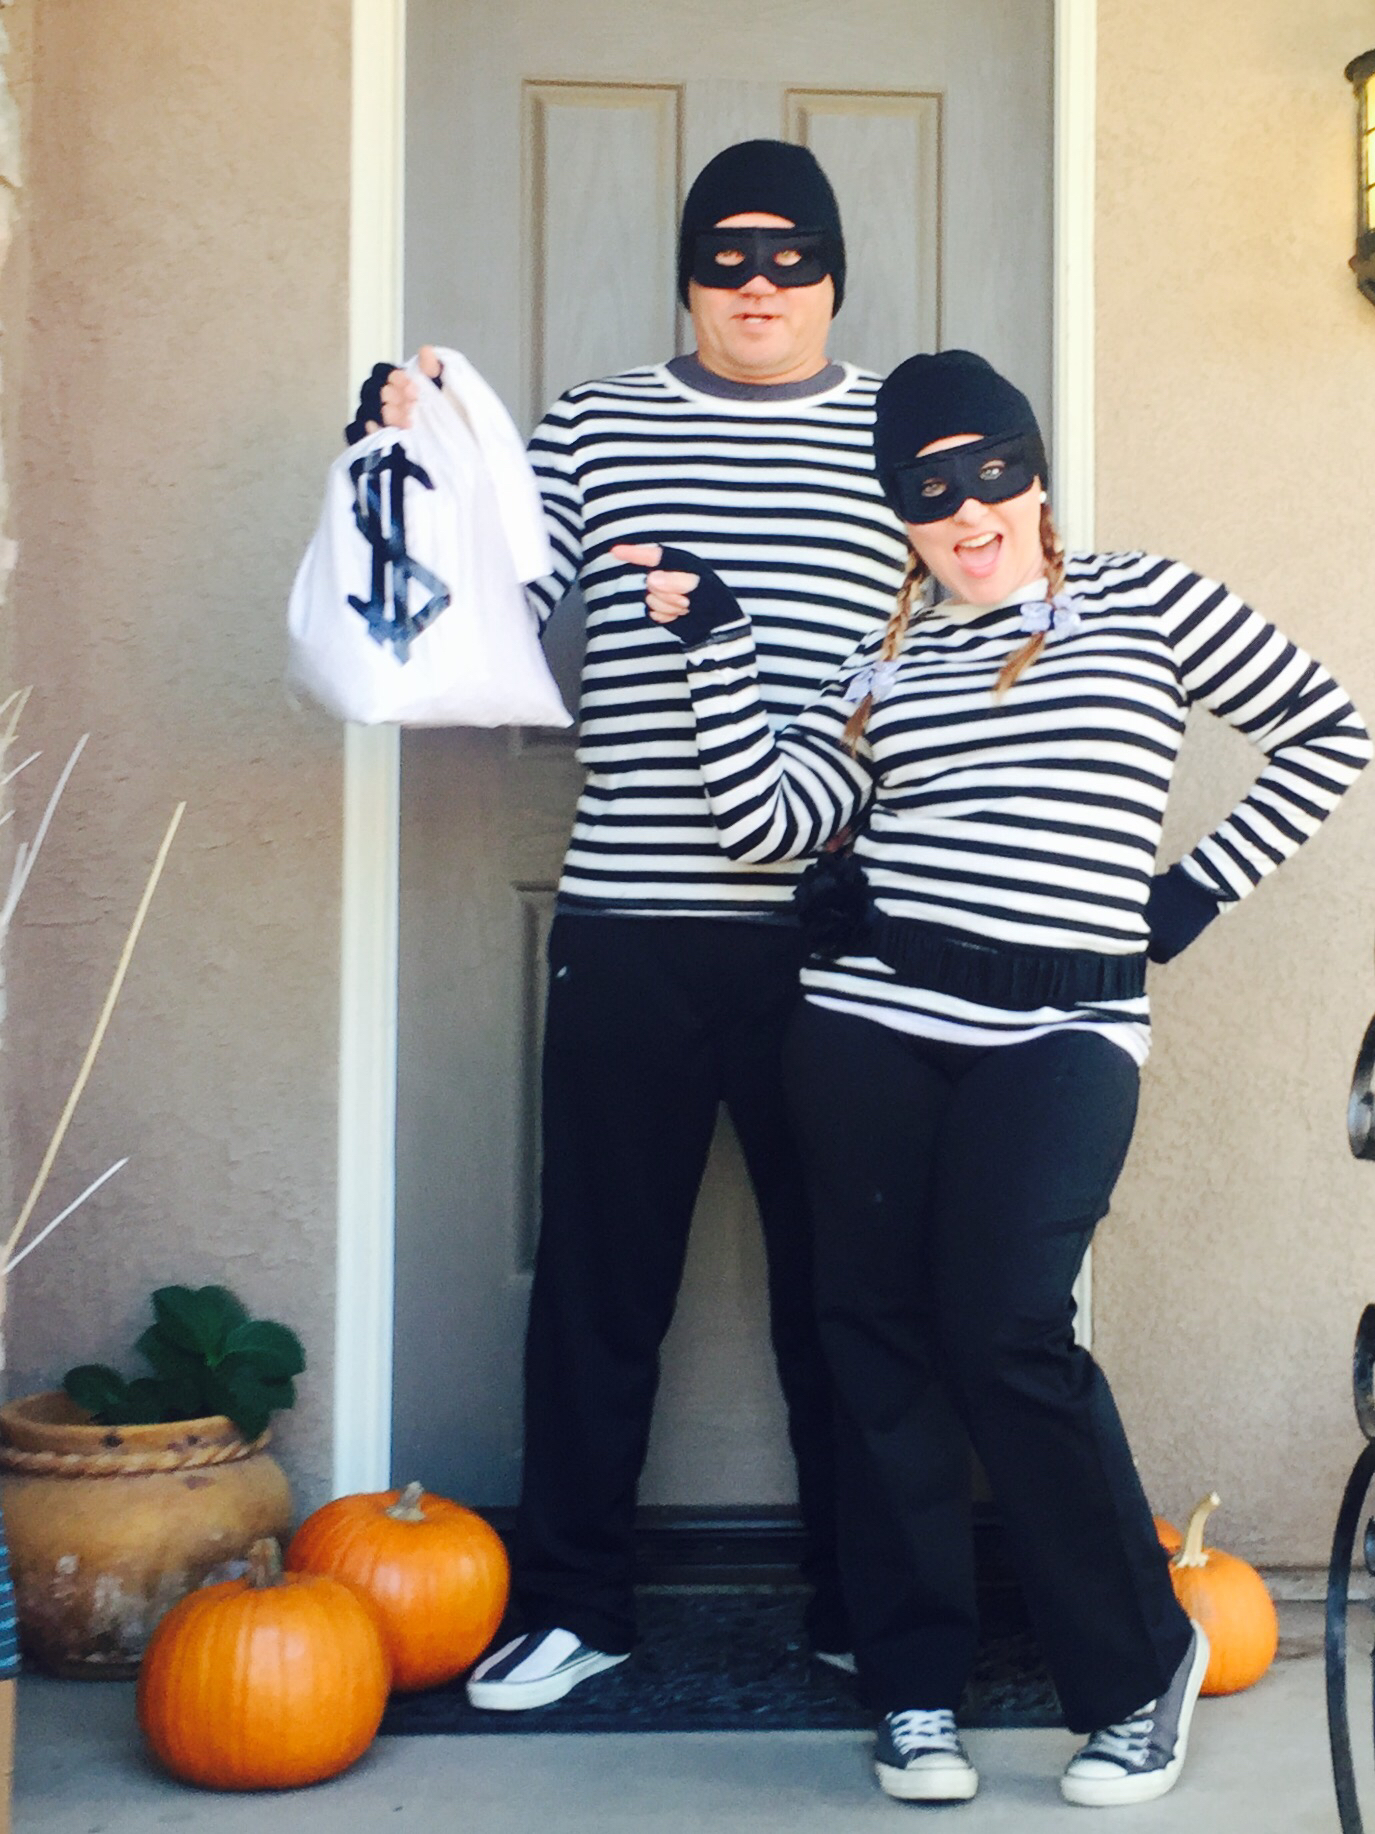 Drawn masks robber I Robber Bandit Costume Easy